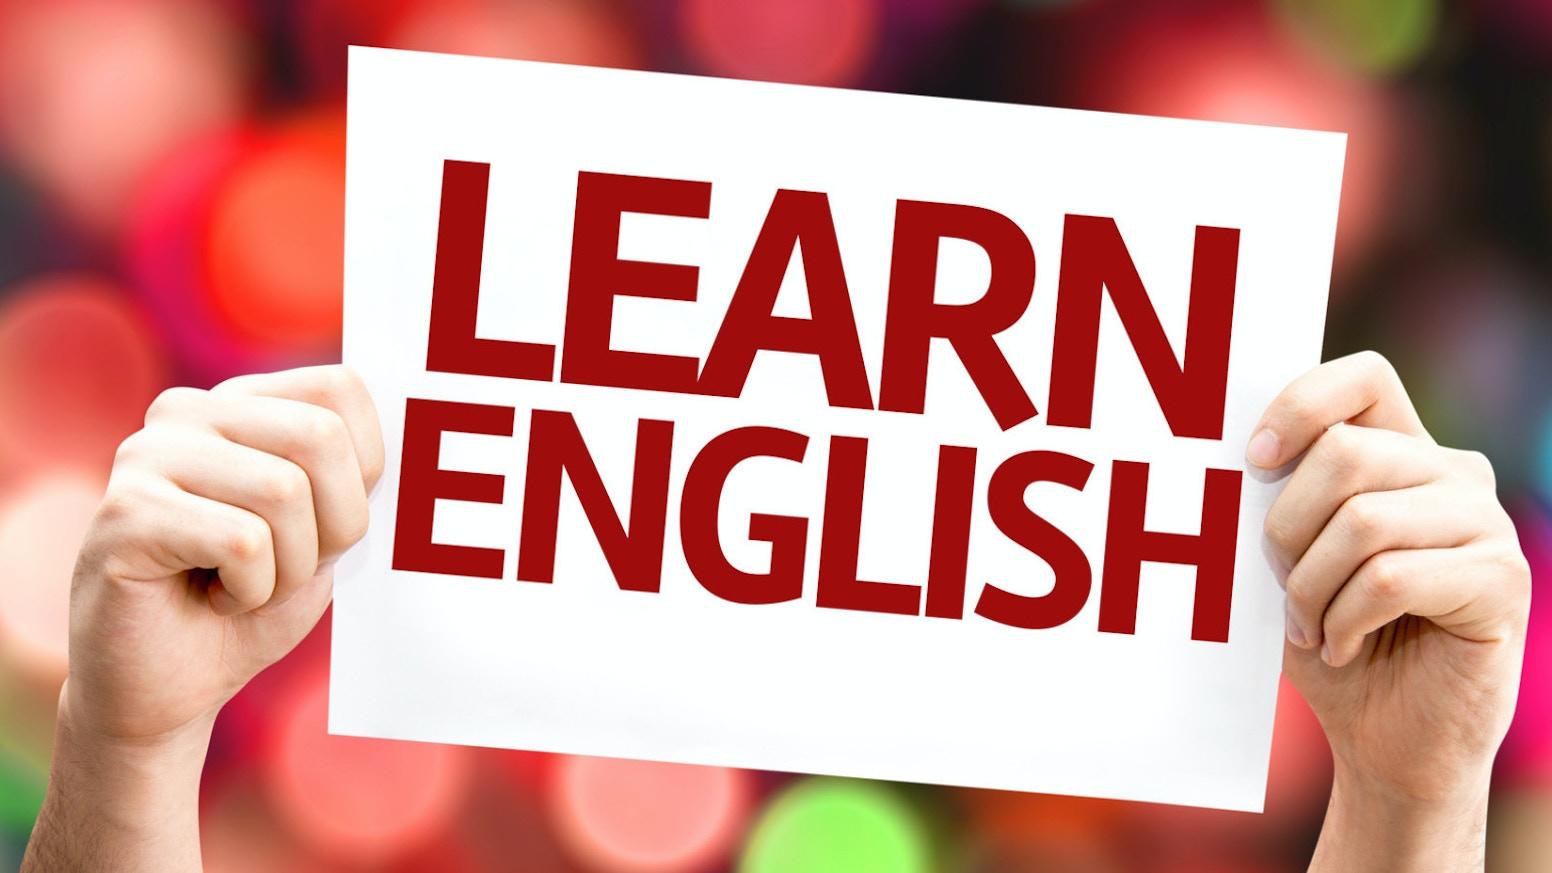 Znalezione obrazy dla zapytania obrazki learn English